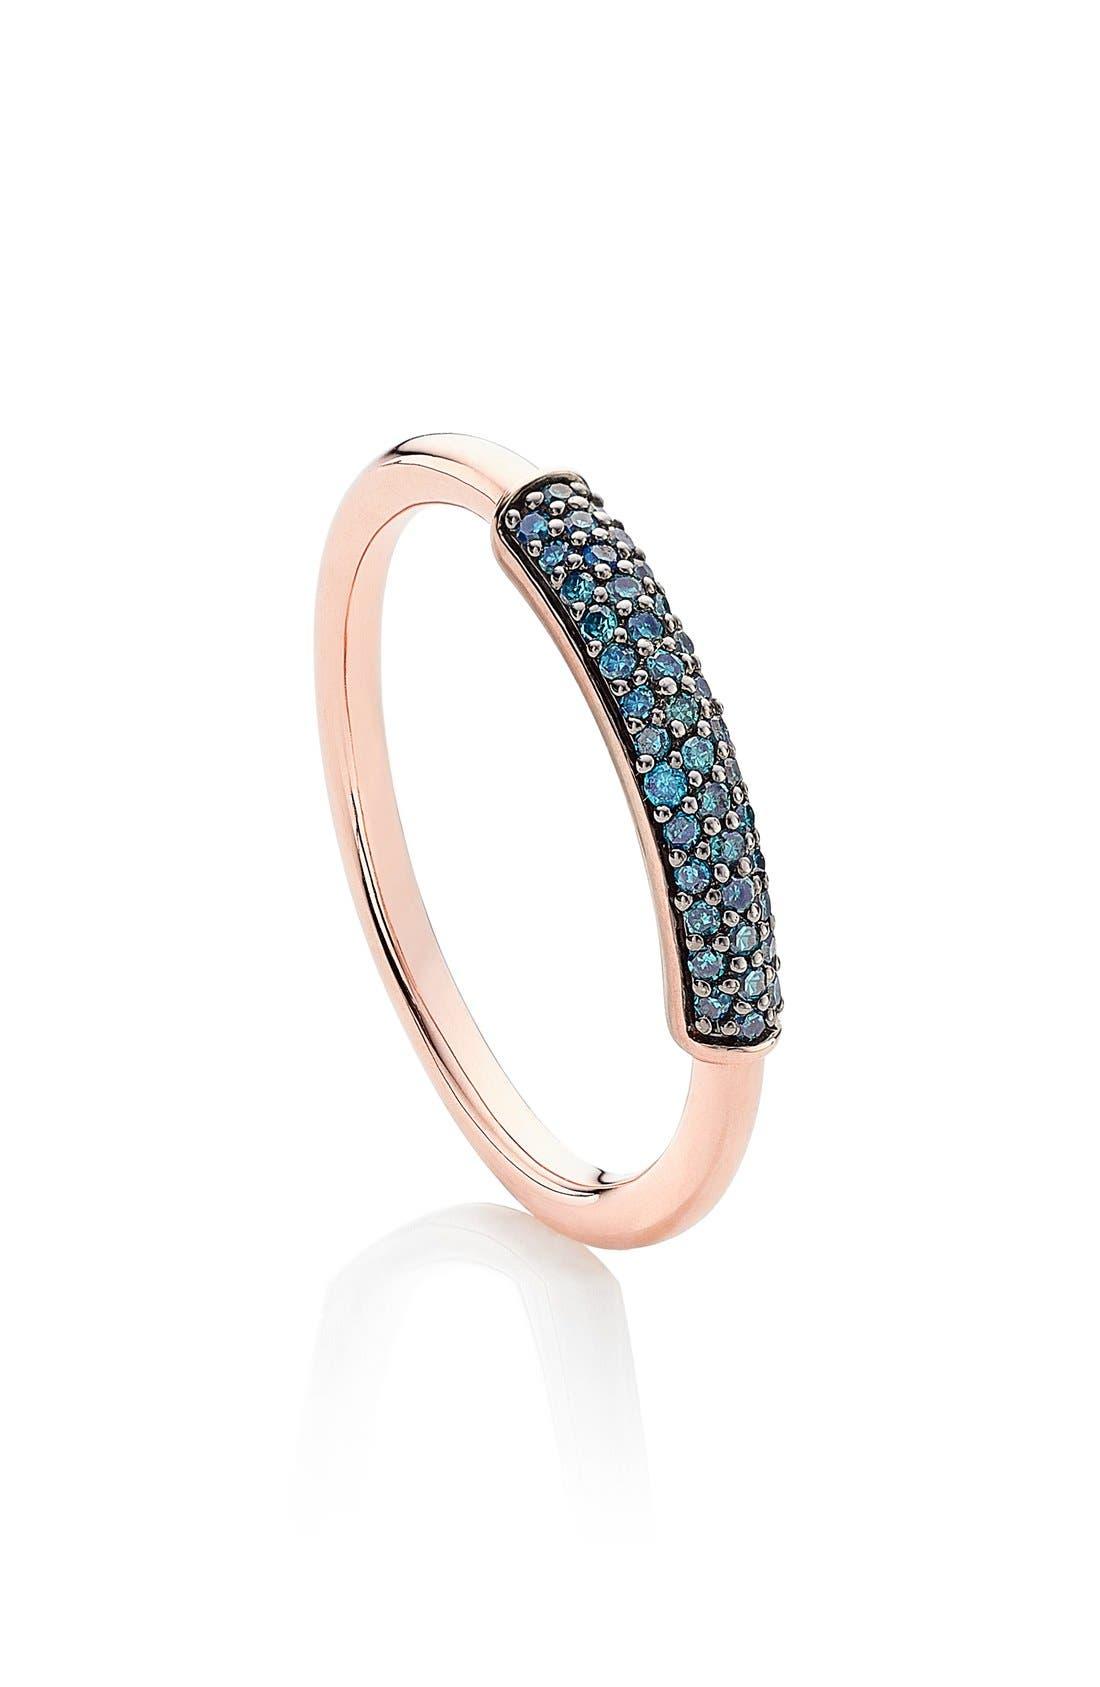 'Stellar' Diamond Band Ring,                             Main thumbnail 1, color,                             BLUE DIAMOND/ ROSE GOLD